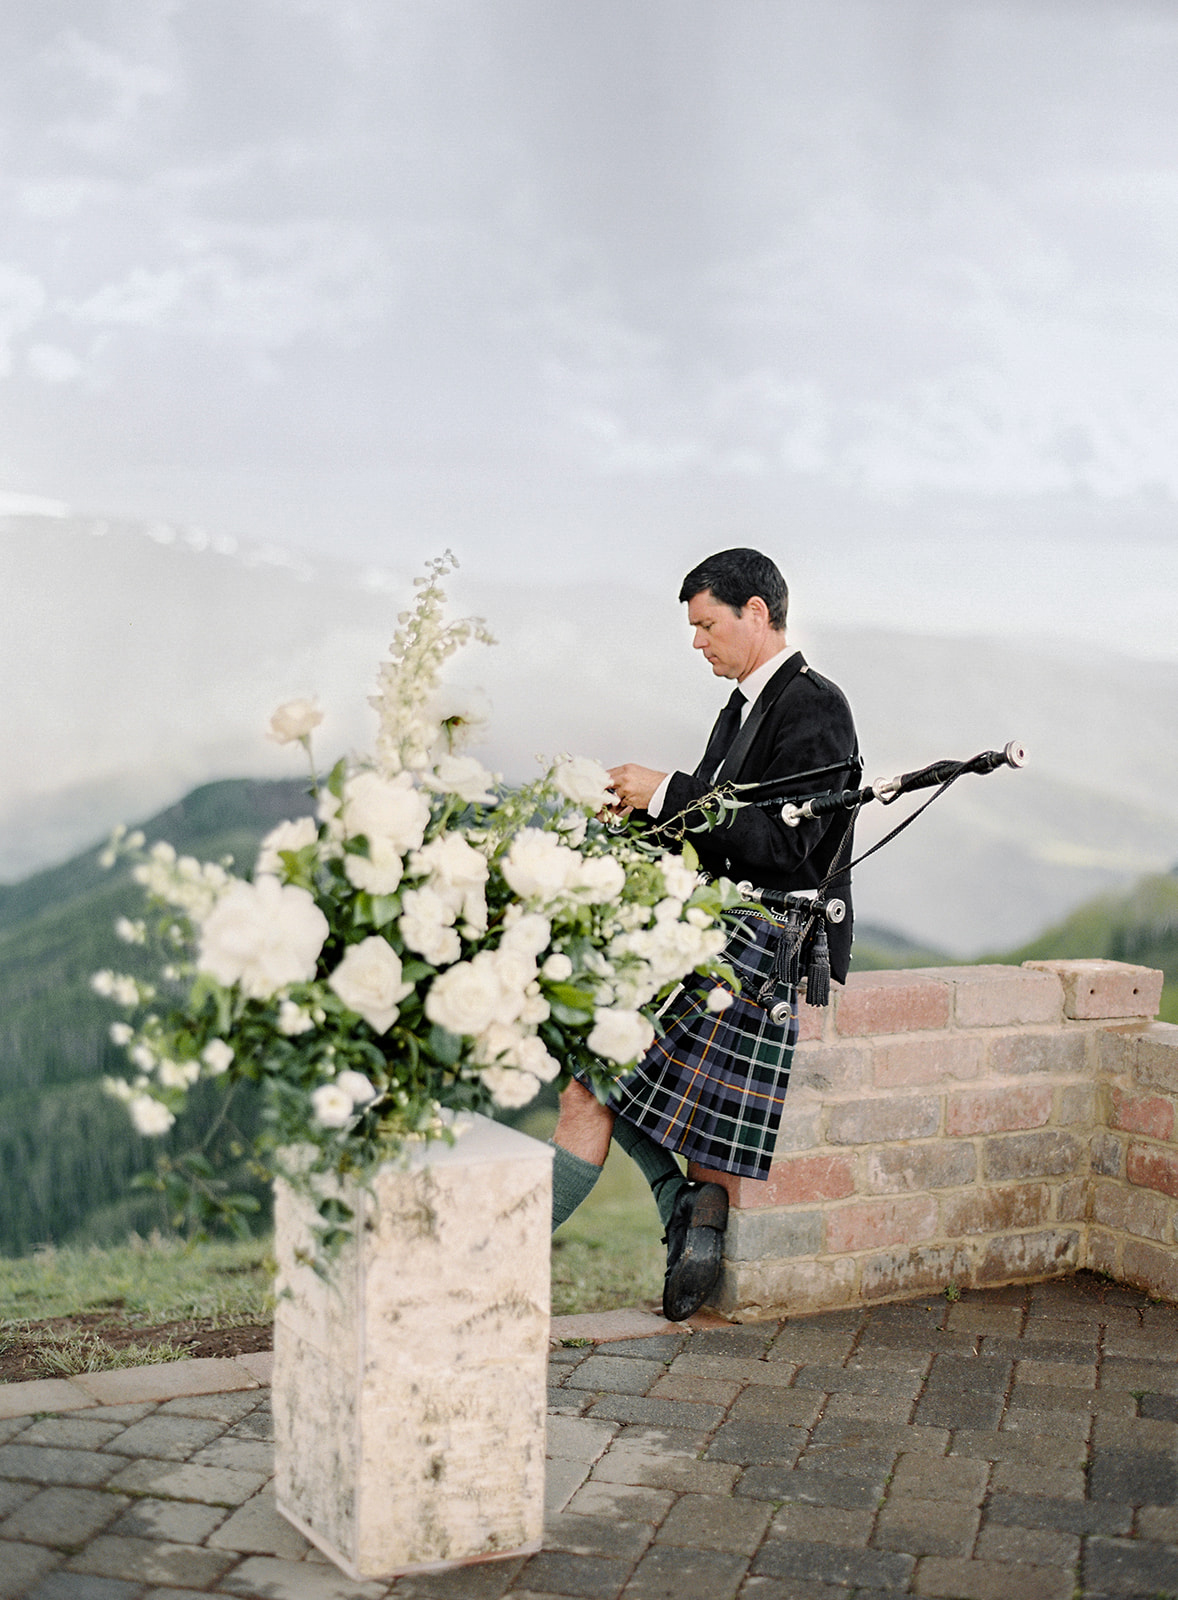 bigpipe player wedding musician outdoor mountain view